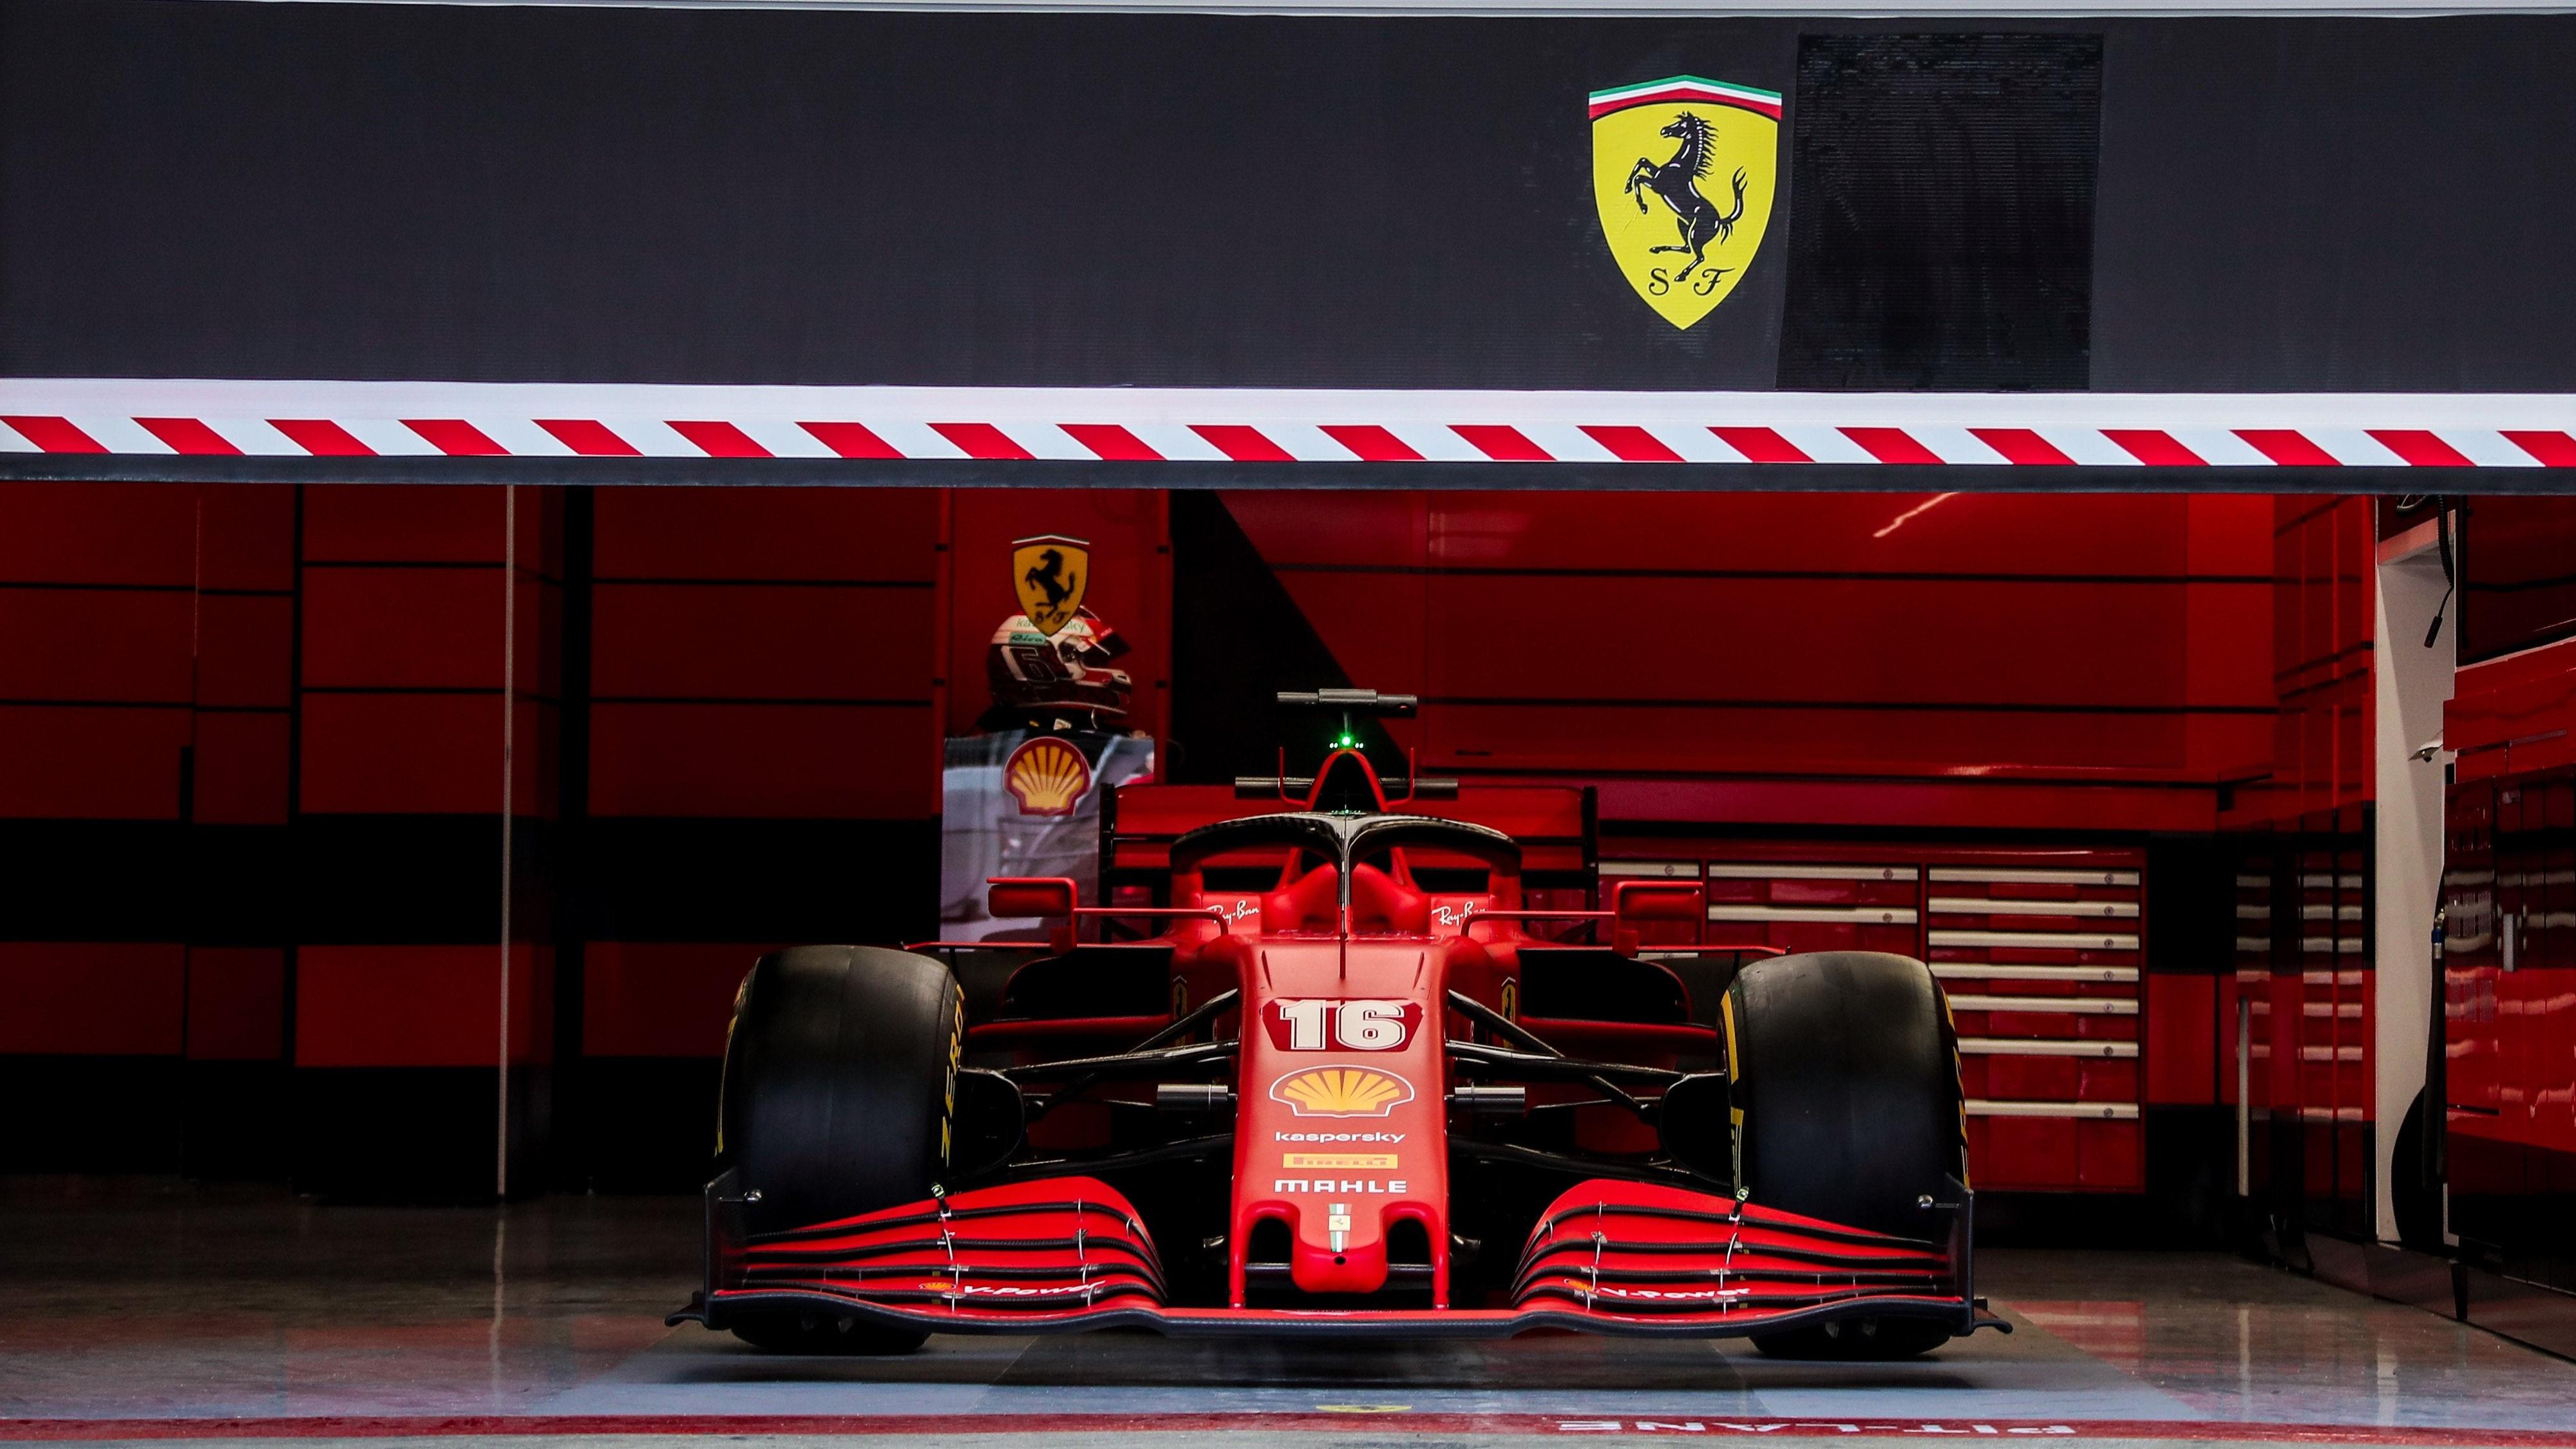 Fond D Ecran Ferrari F1 F1 2020 Formule 1 Ferrari Sf1000 Pistes De Course 4000x2250 Garett 1947373 Fond D Ecran Wallhere